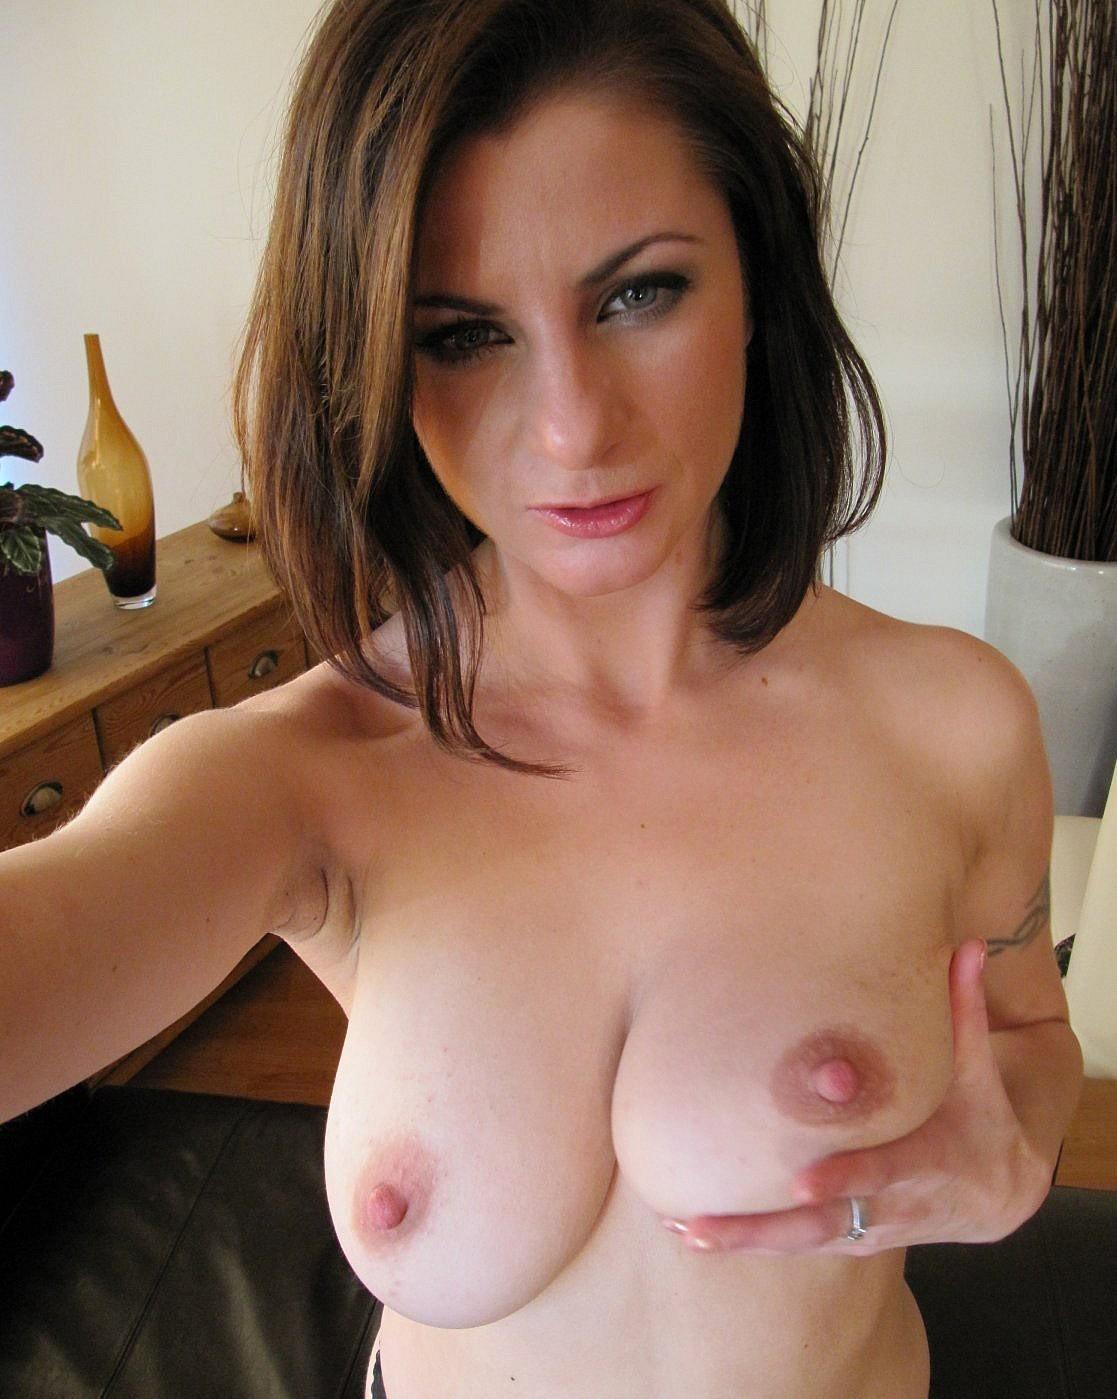 Sasha alexander naked photos